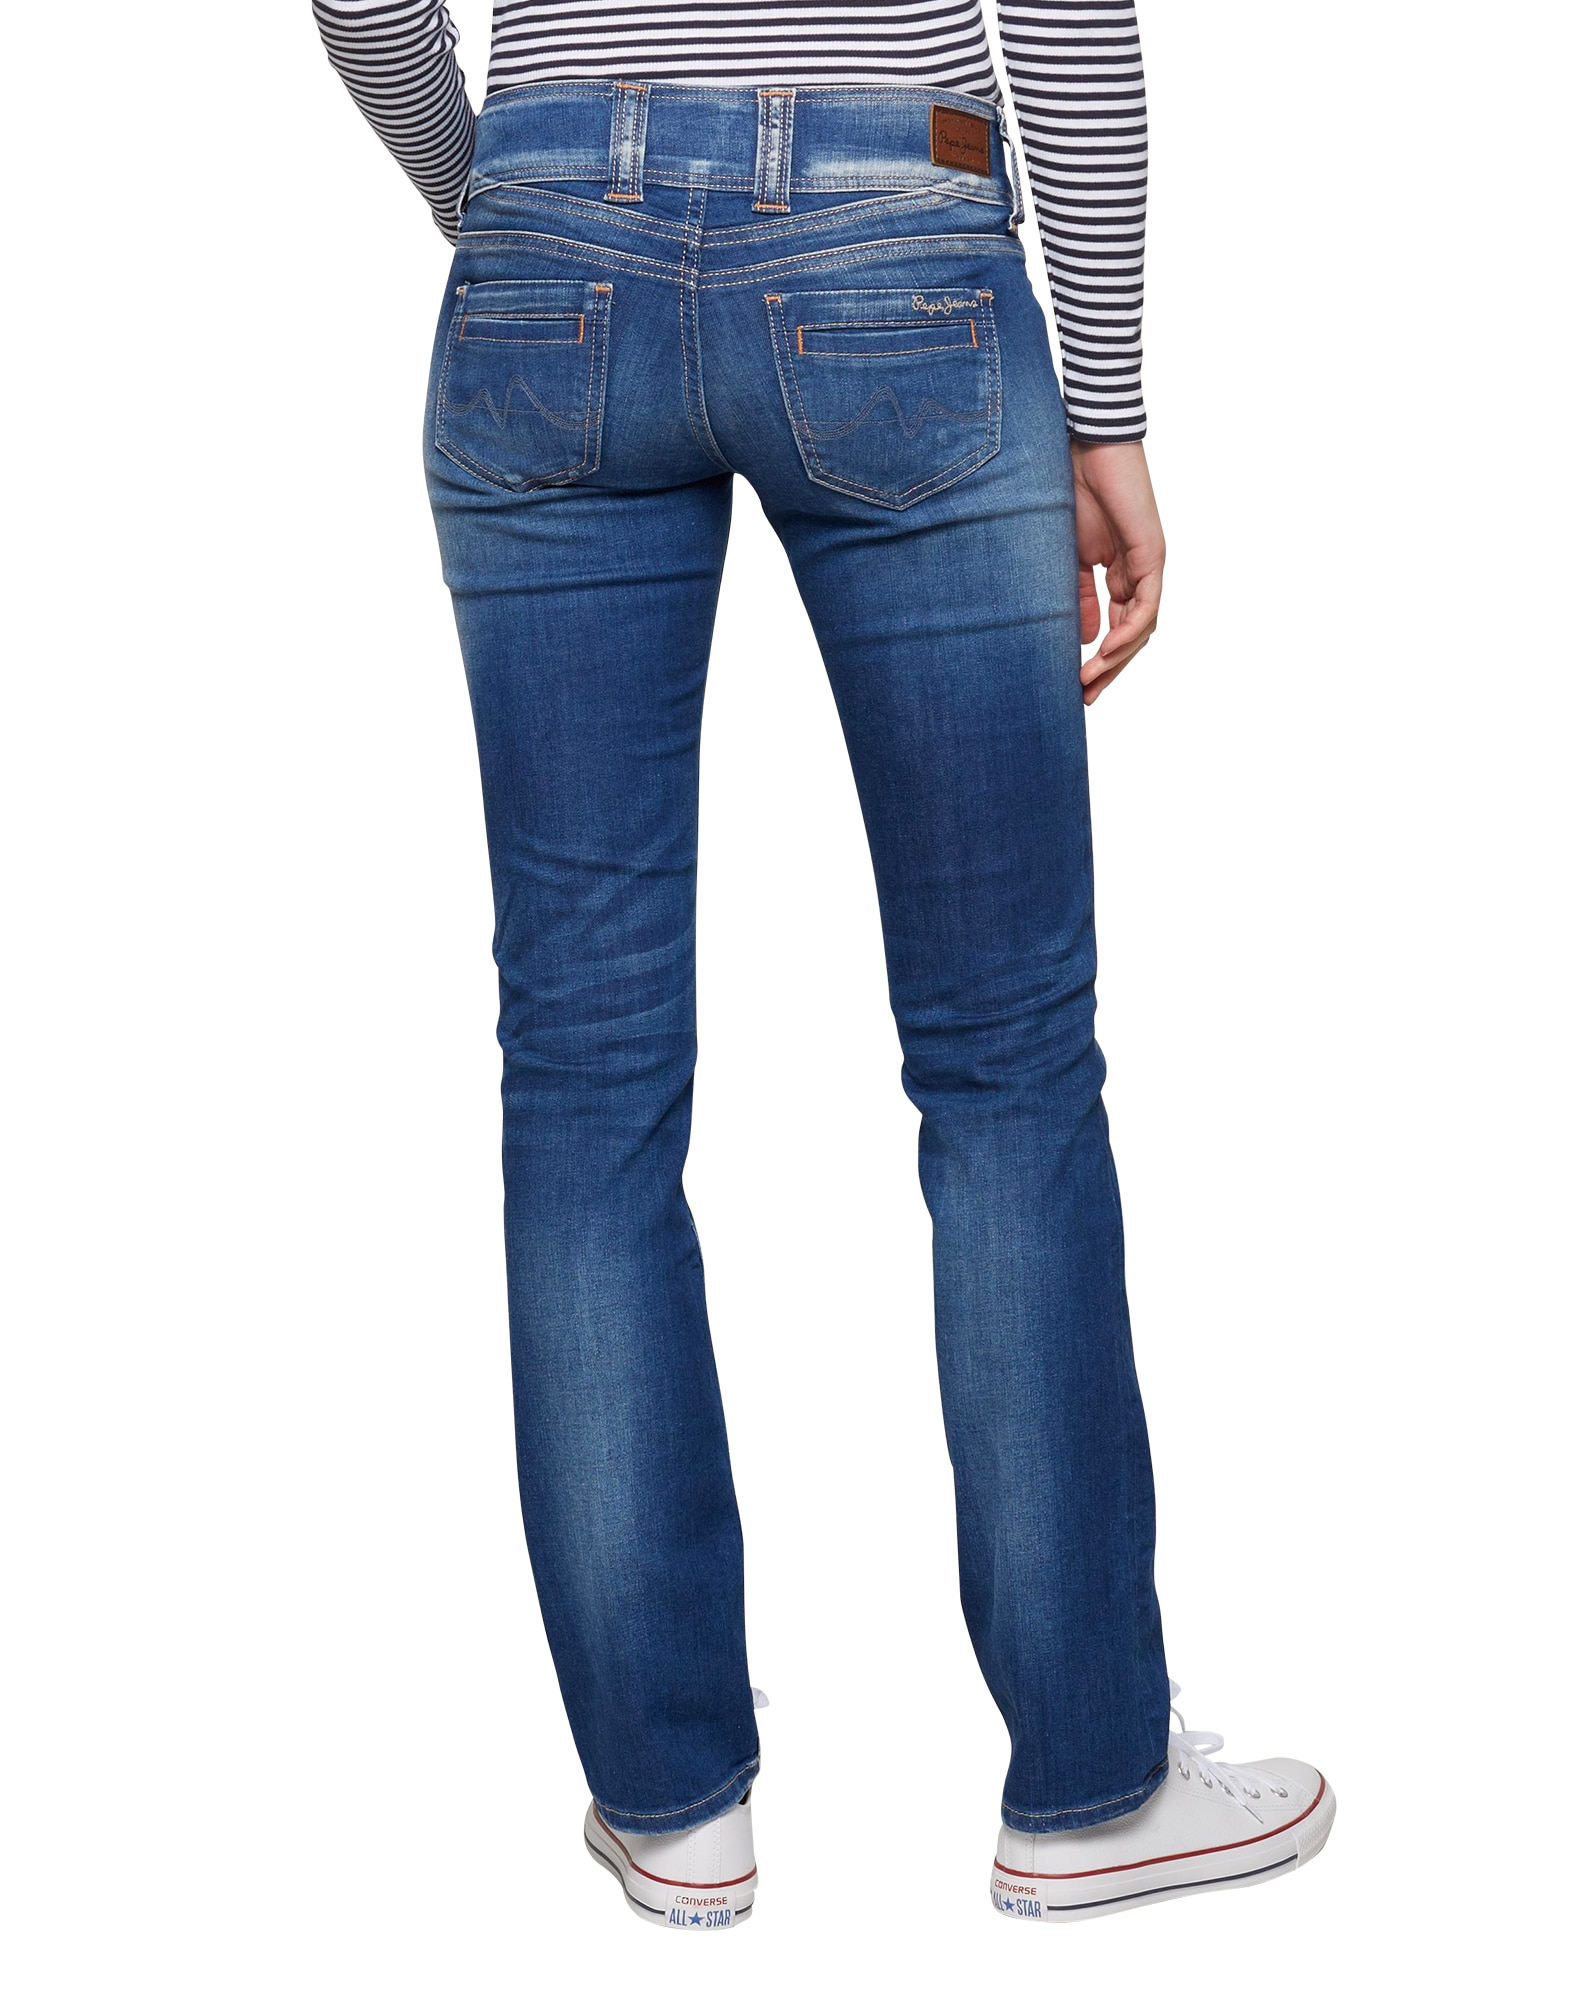 Pepe Jeans Džínsy 'Gen'  modrá denim.